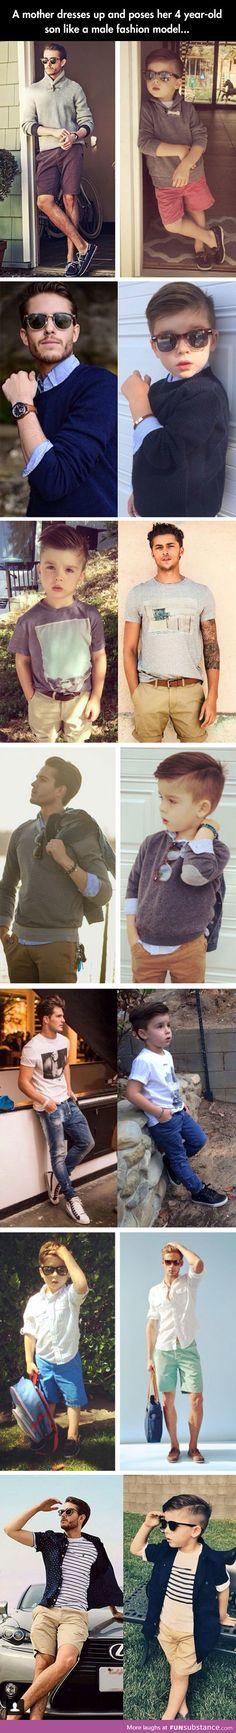 Kid super model